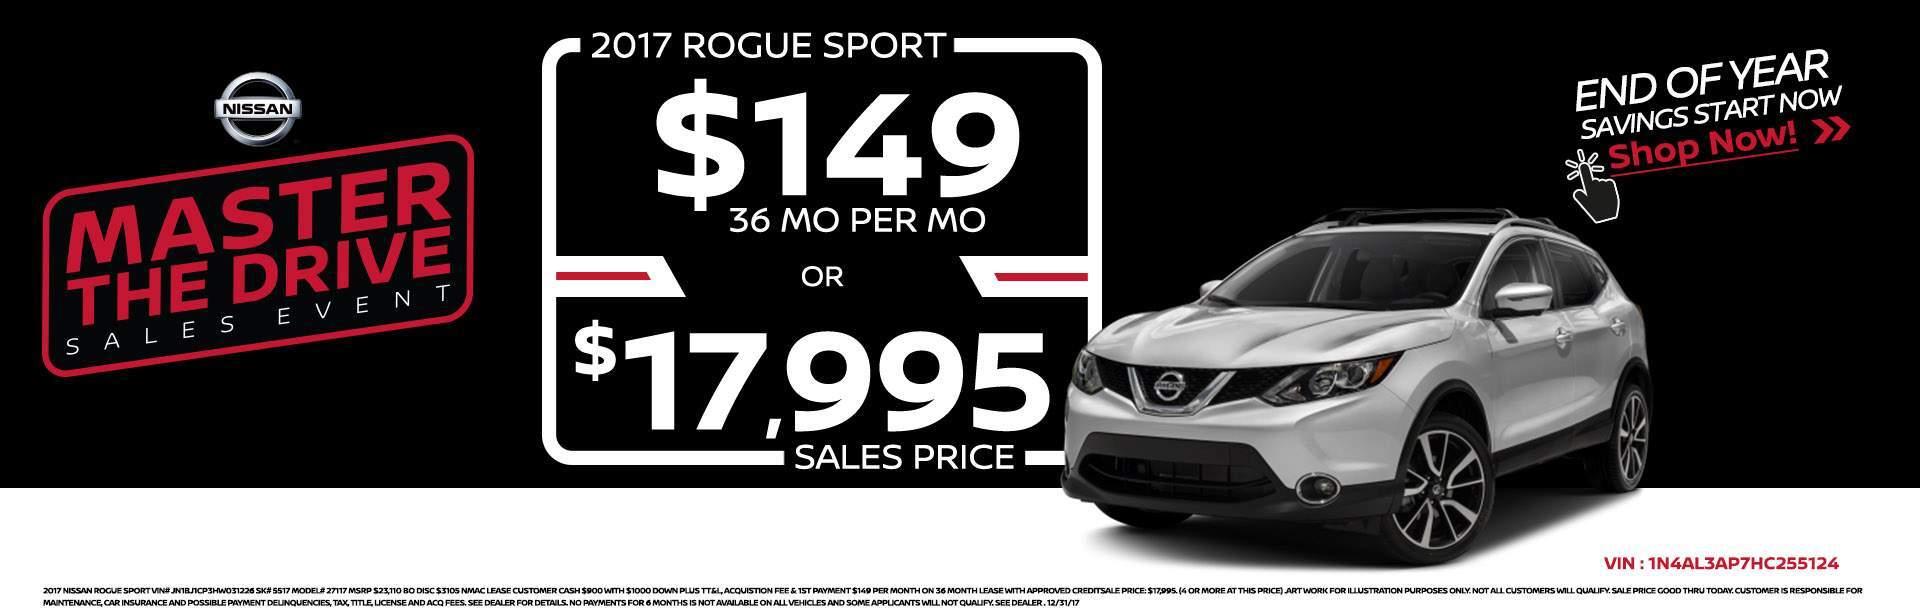 Hertz Car Sales Orlando >> Vehicles For Sale Reed Nissan Nissan Dealer Orlando   Upcomingcarshq.com